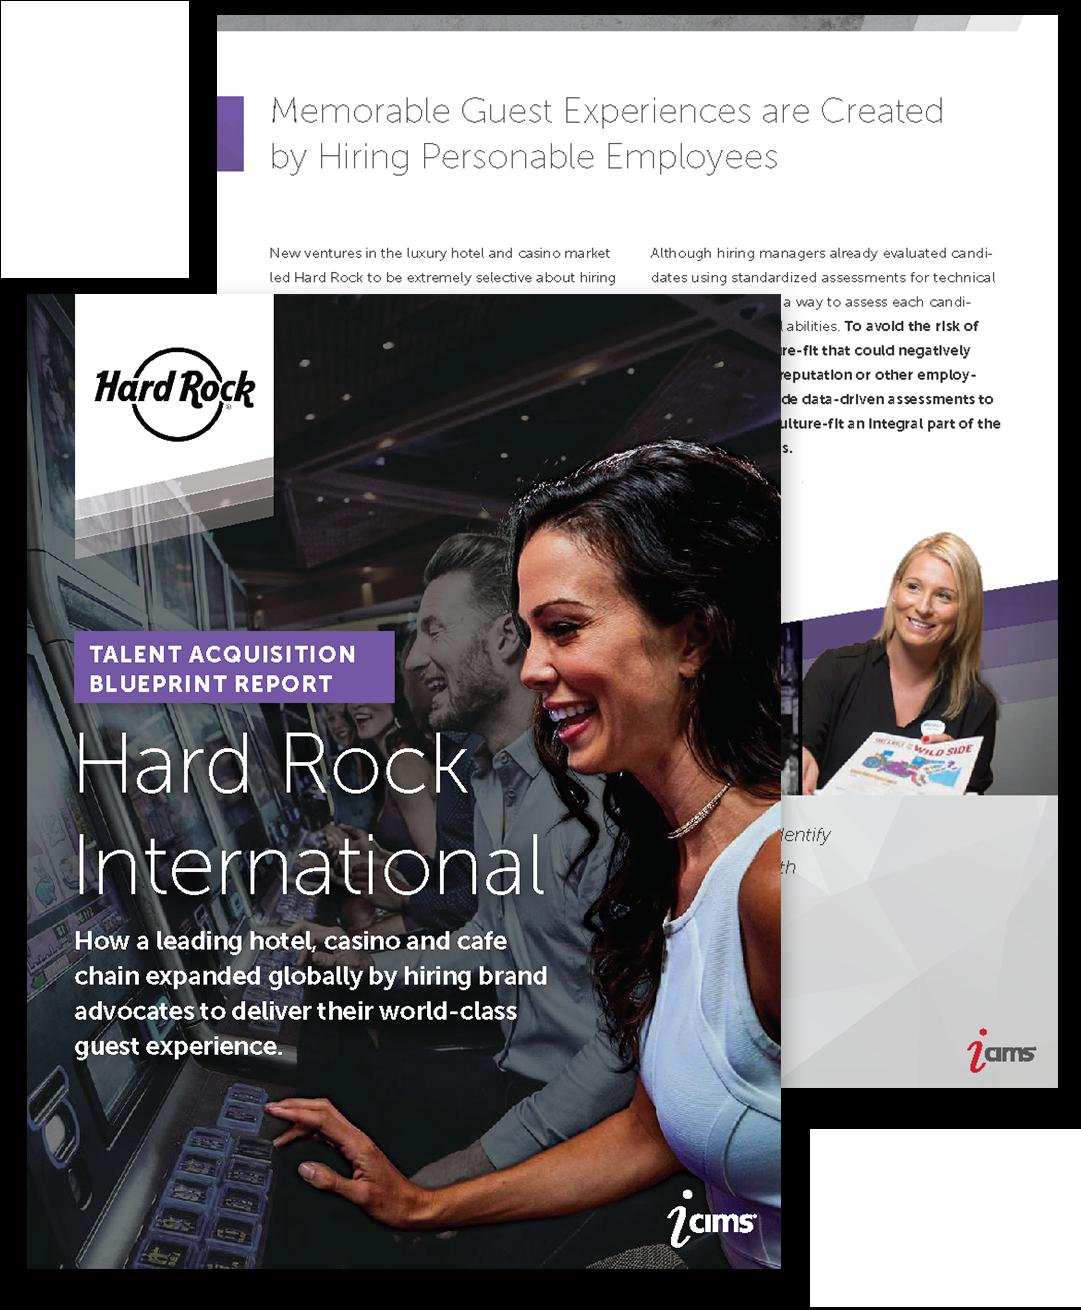 Hard Rock International Talent Acquisition Blueprint Report